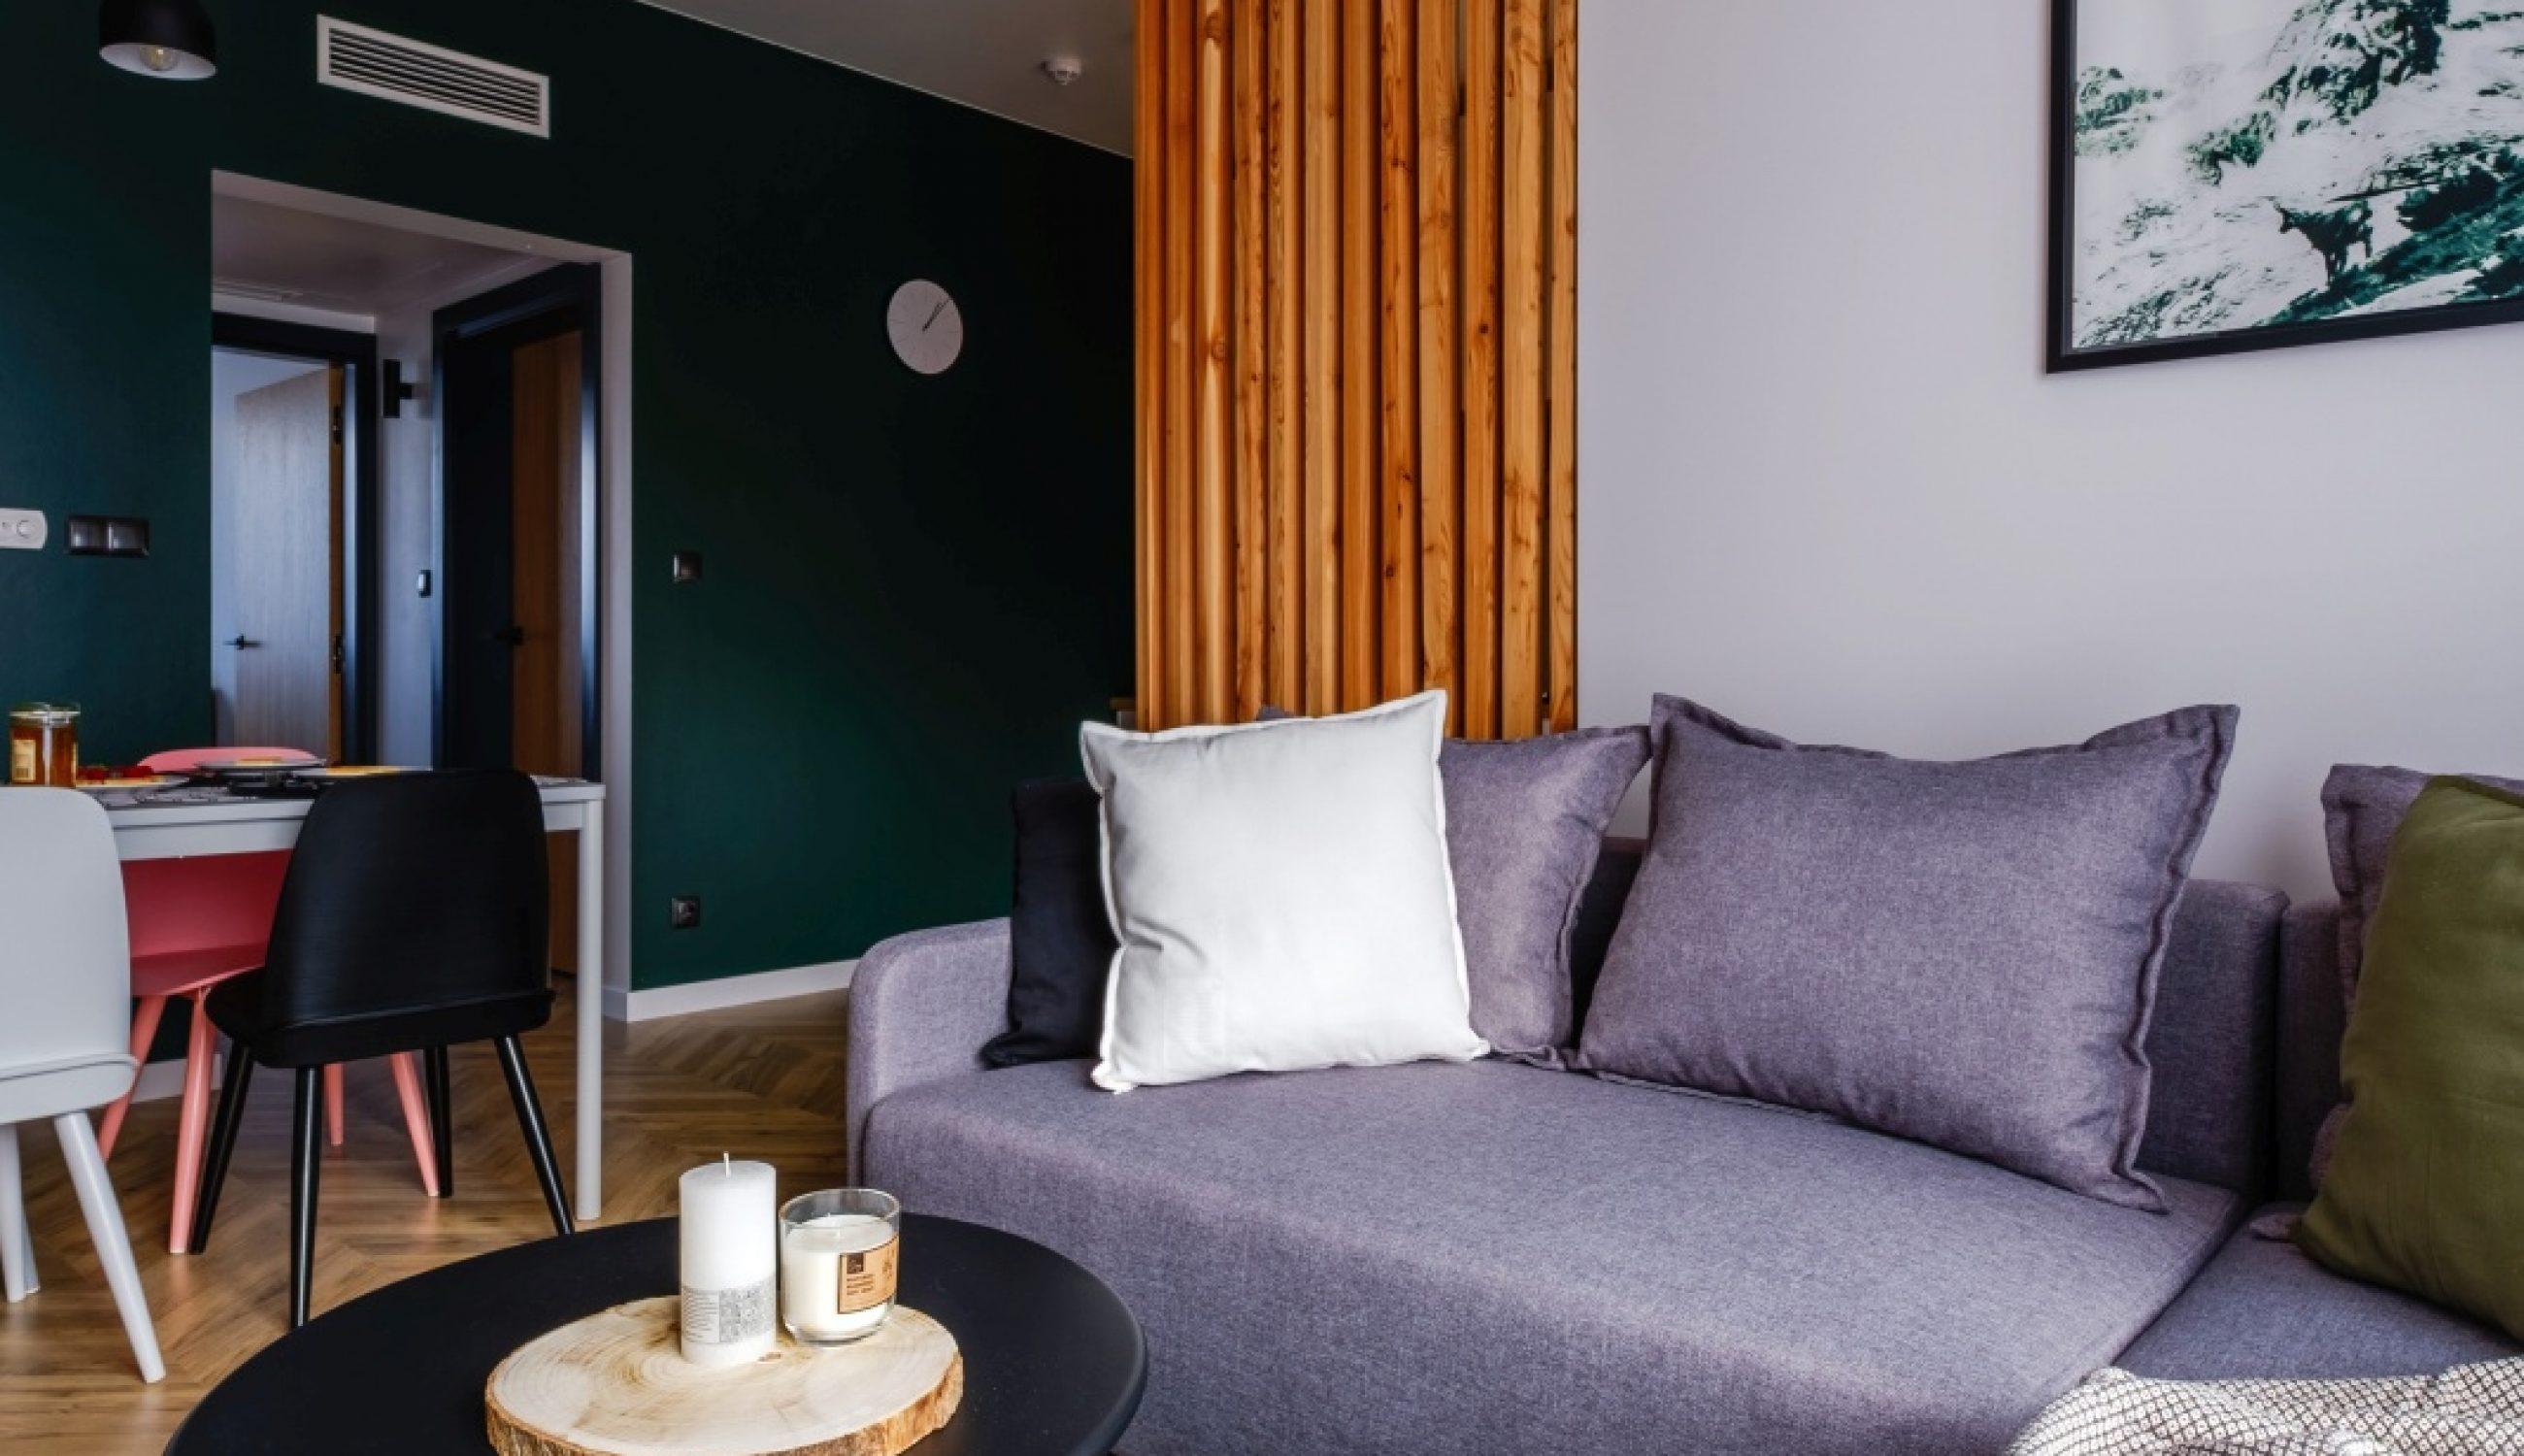 Apartamenty NOVA BIAŁKA Białka Tatrzańska apartament 5 salon sofa